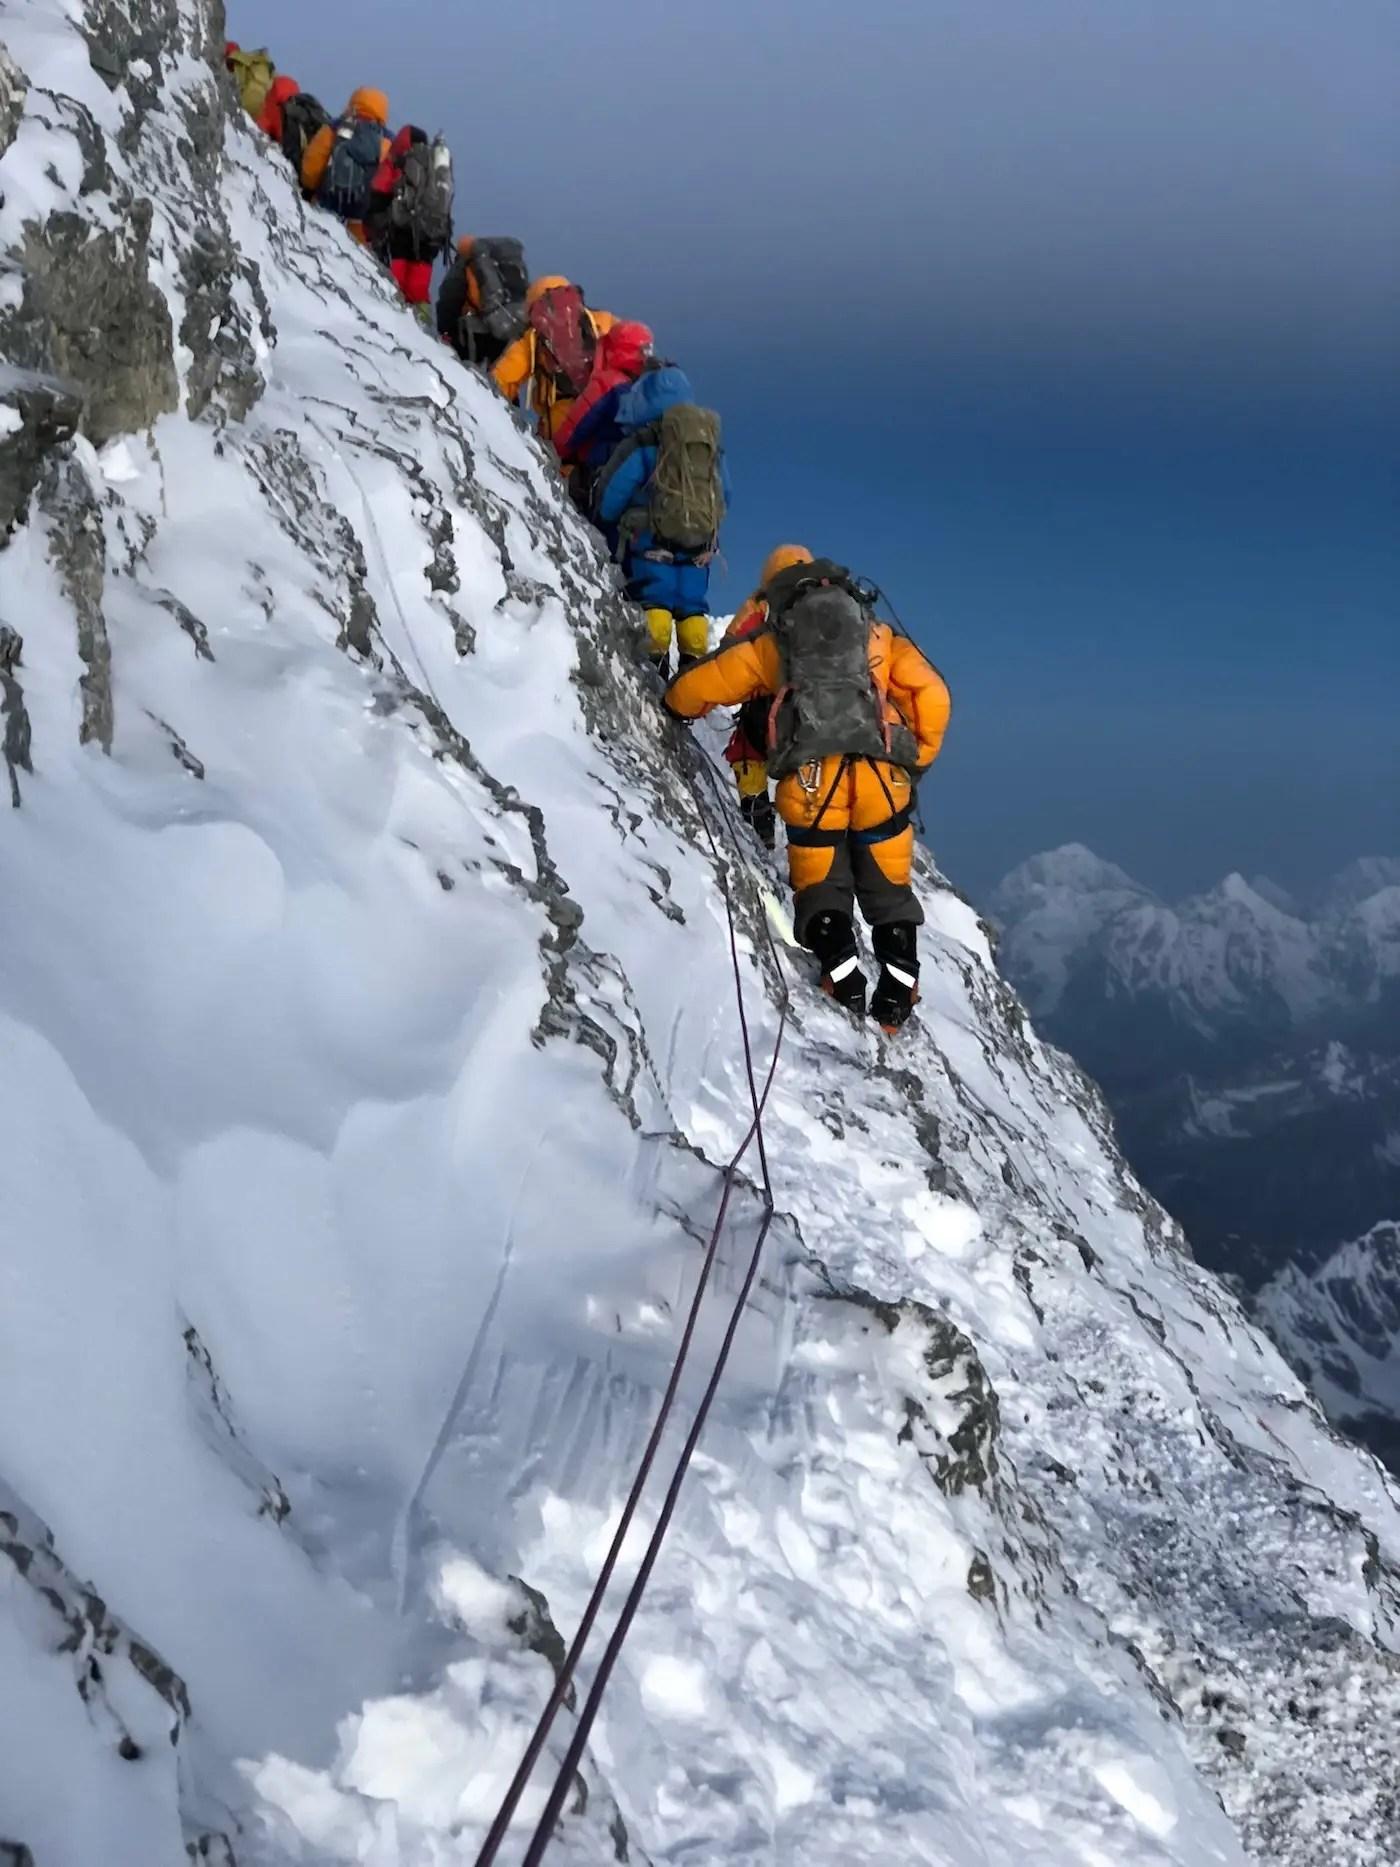 A Climber Saw Her Partner Break His Leg On Mount Everest